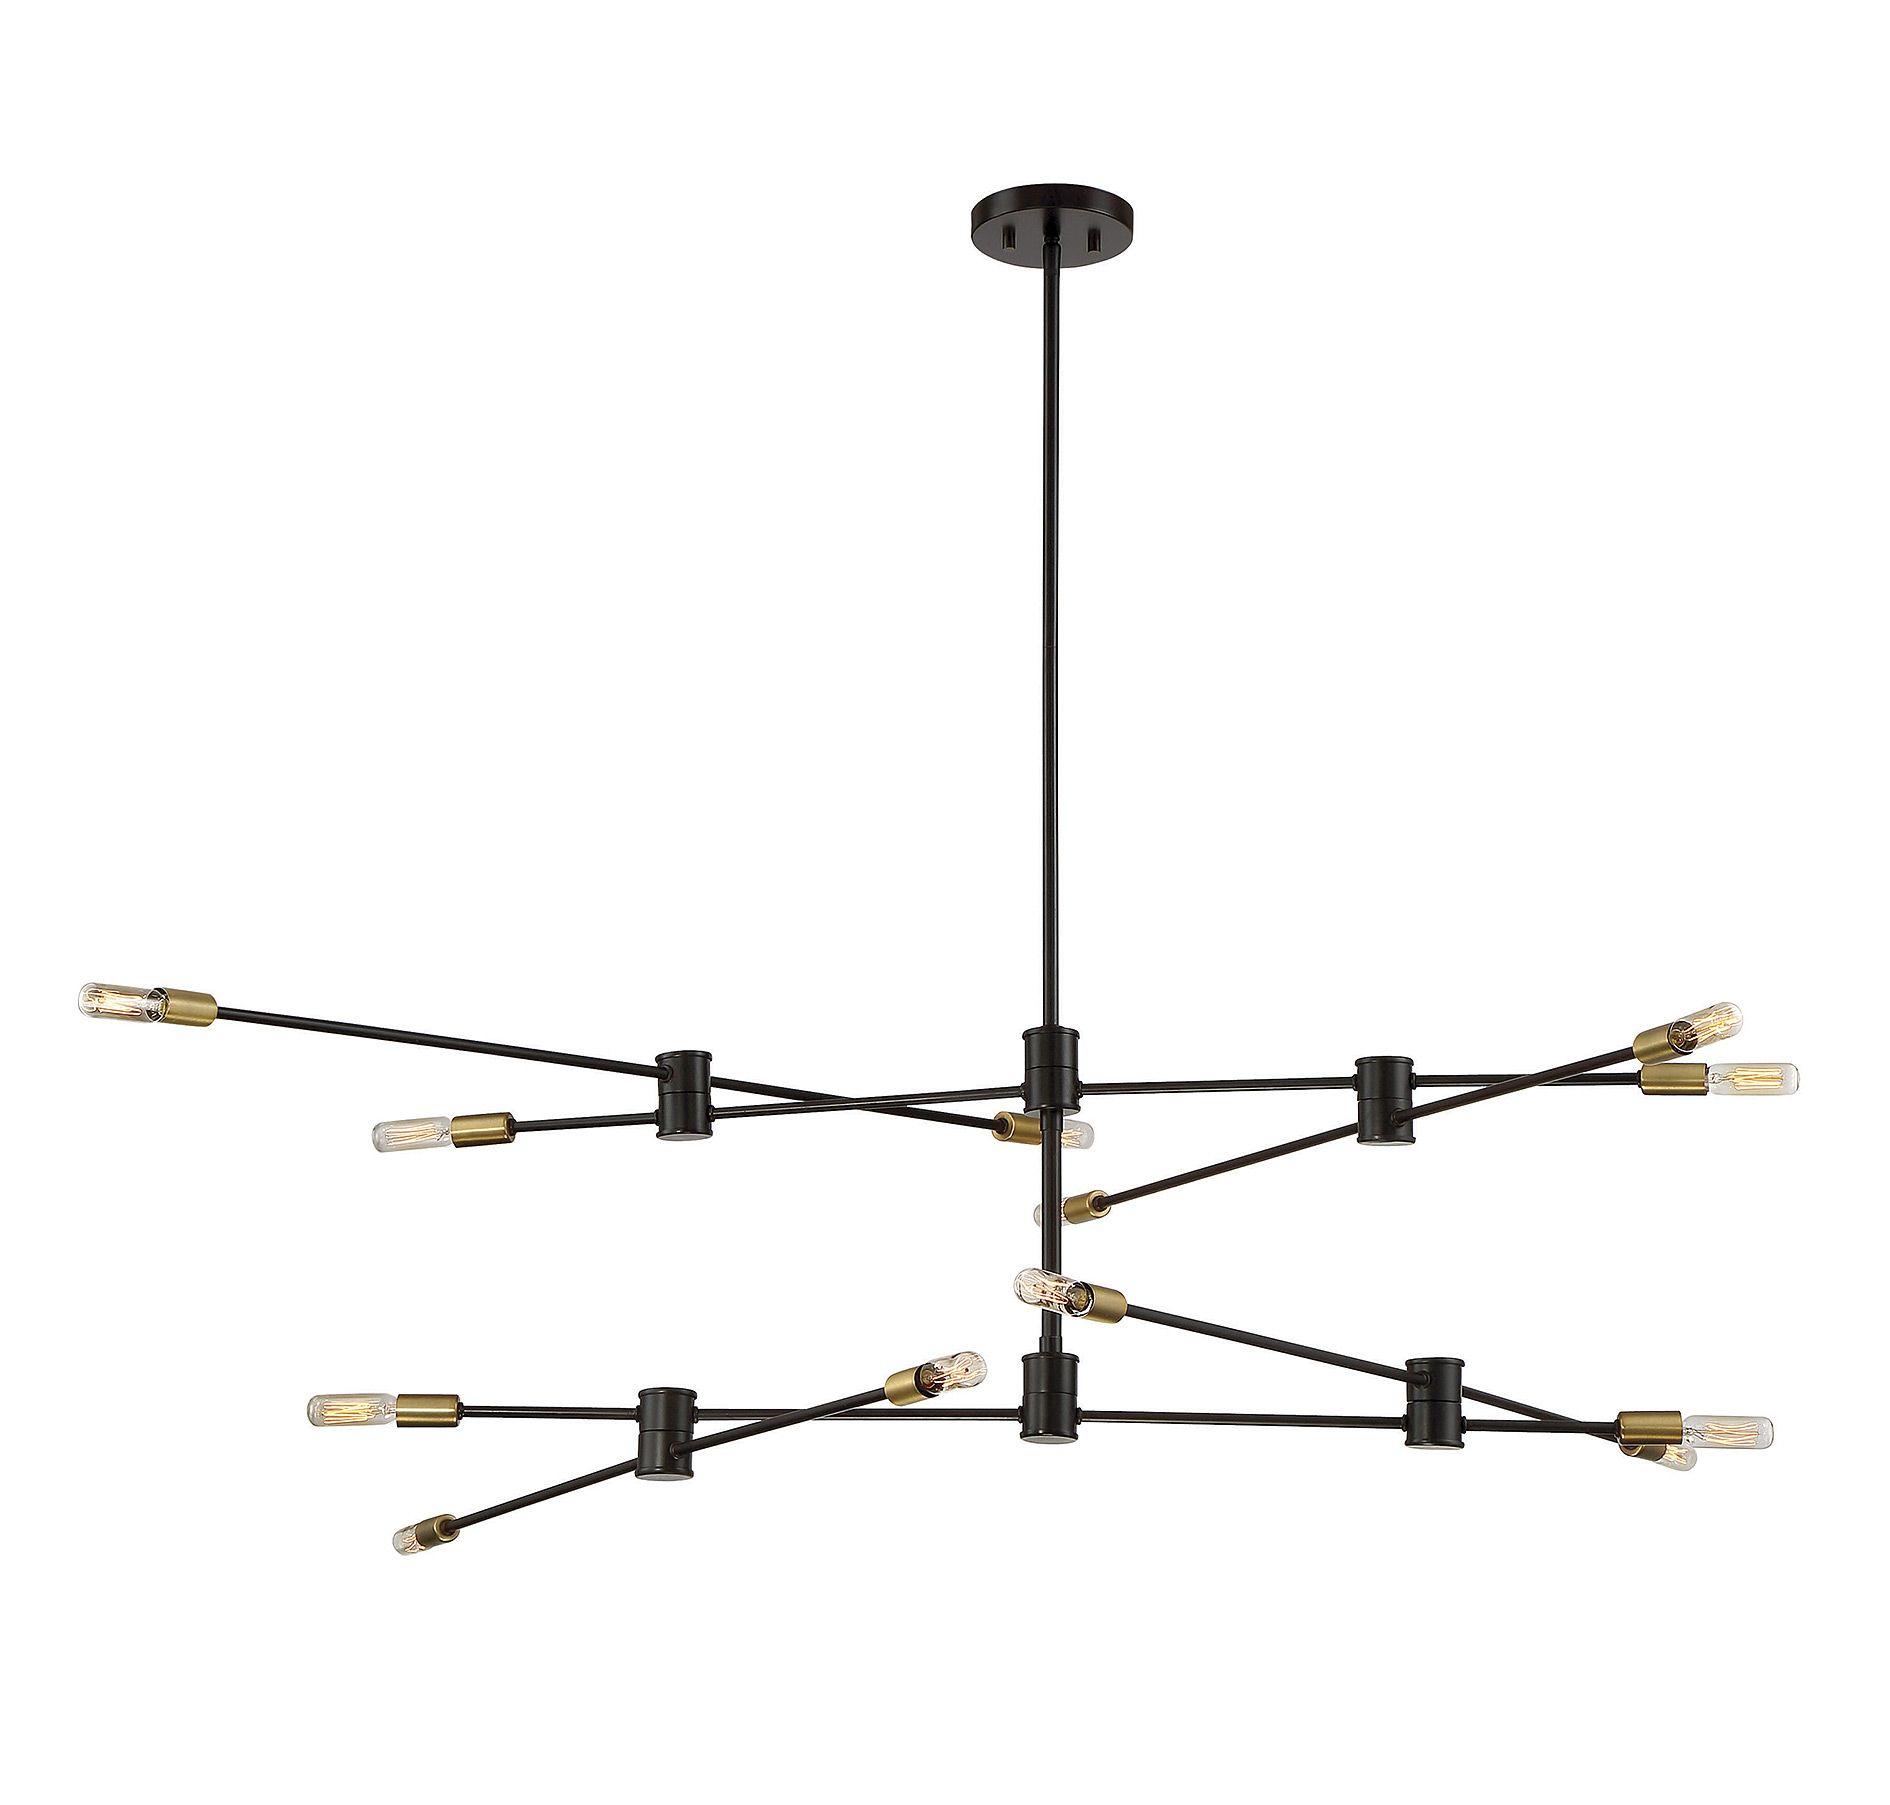 Lyrique 12 Light Chandelier | Lighting | Bronze Chandelier pertaining to Johanne 6-Light Sputnik Chandeliers (Image 18 of 30)